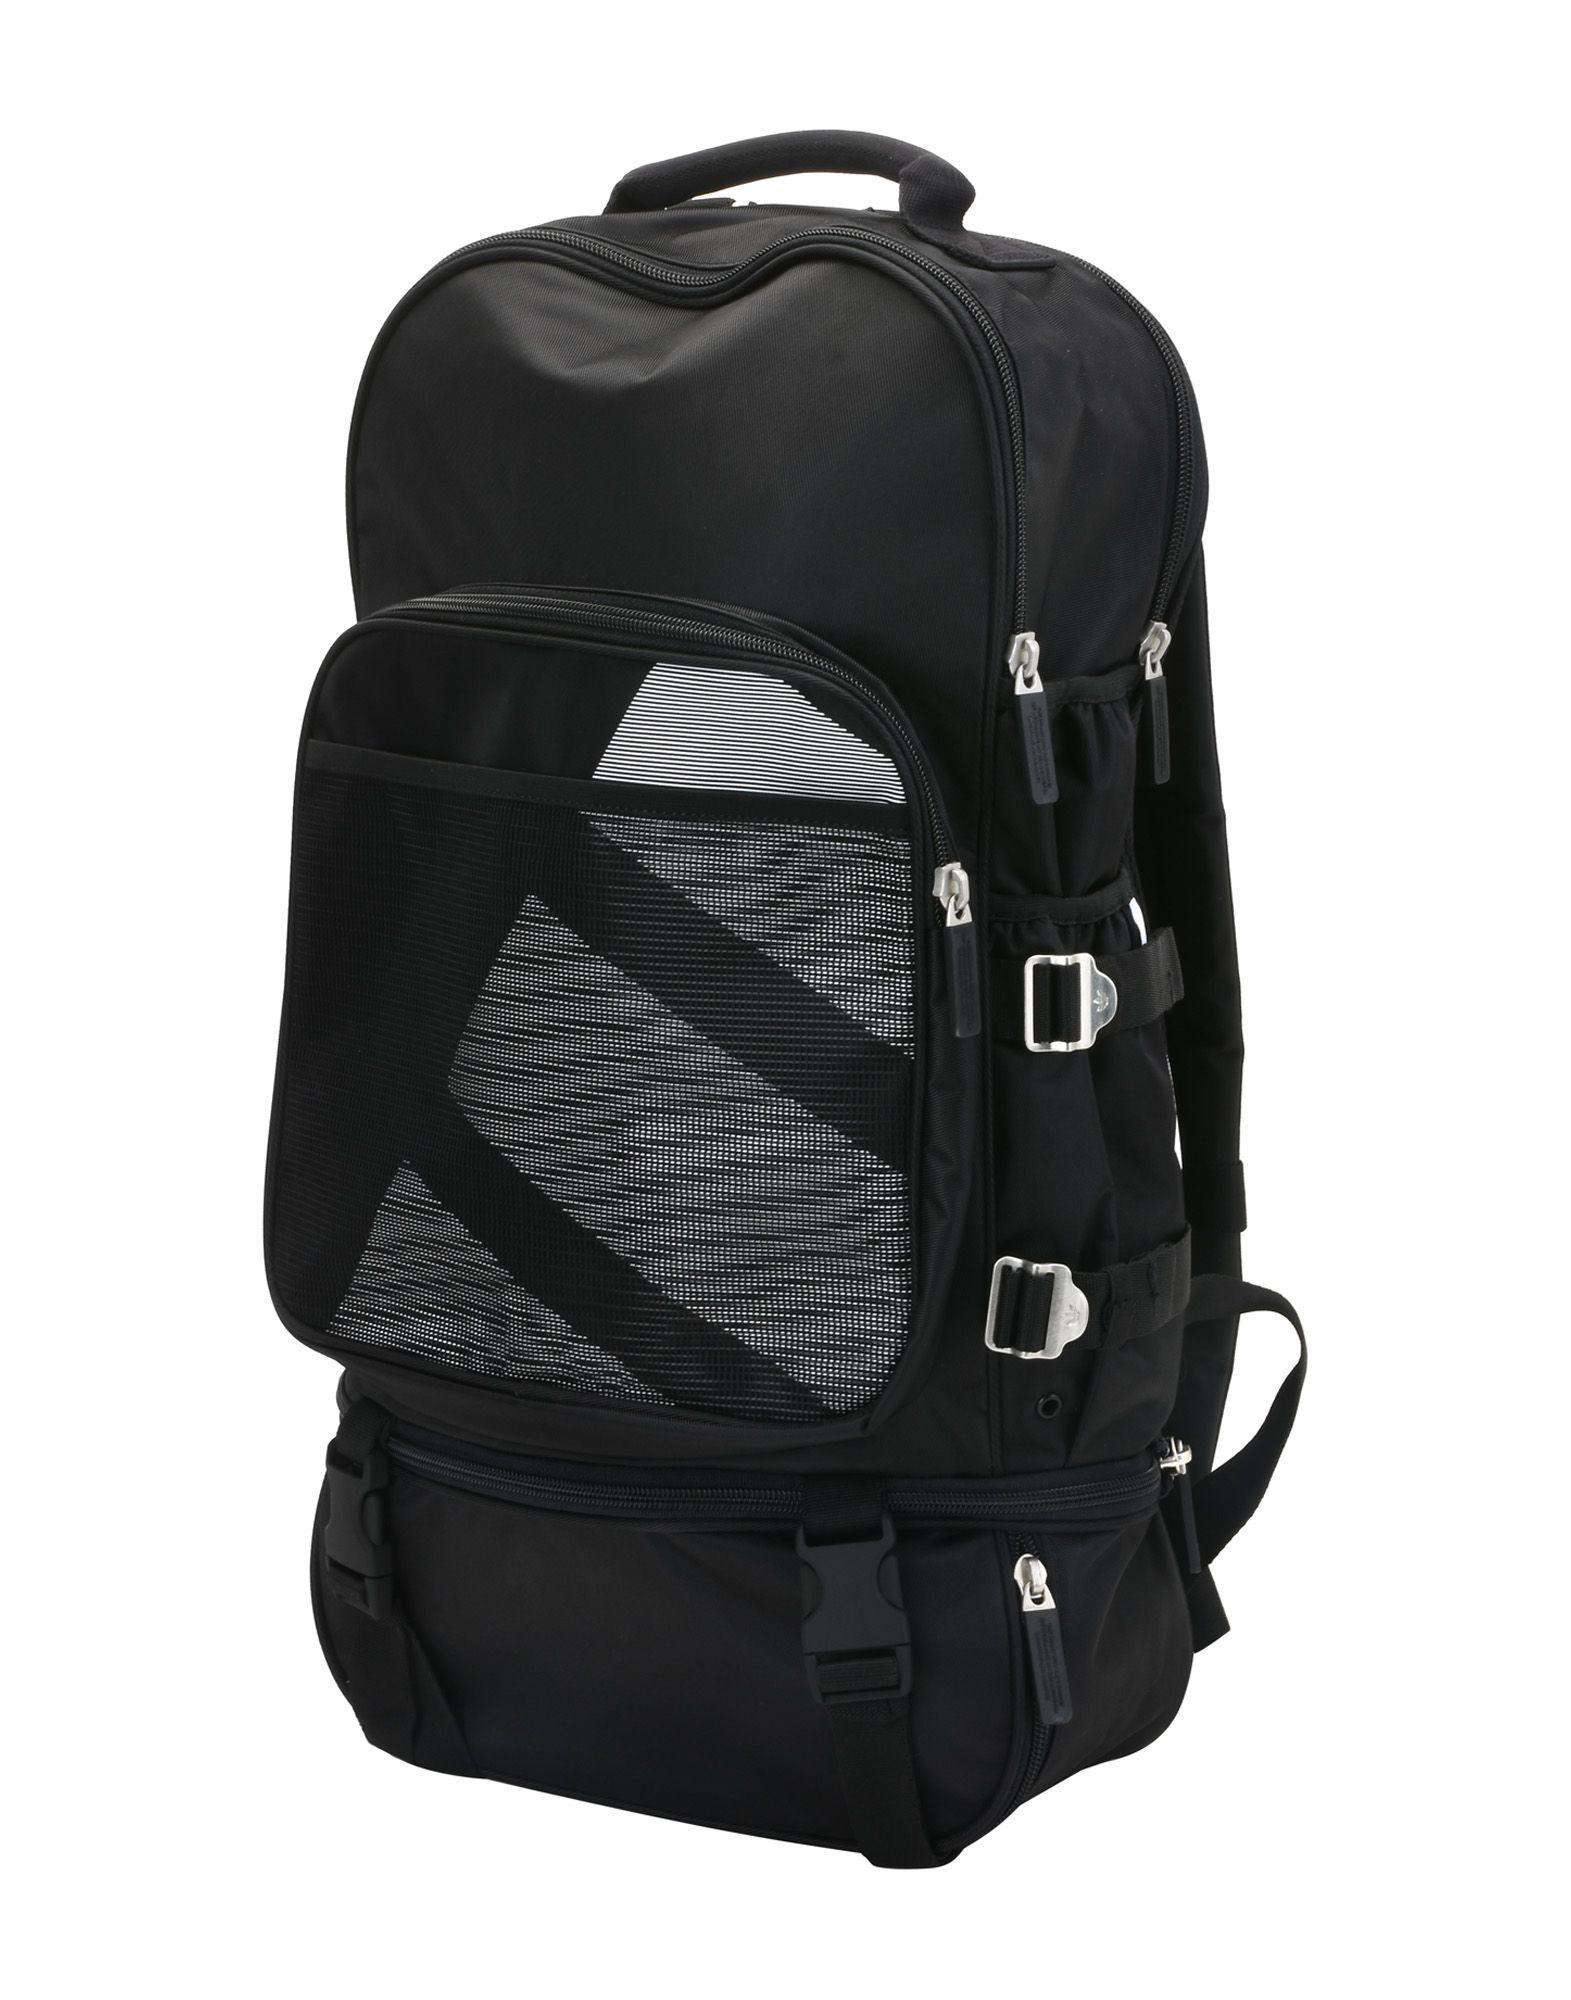 Adidas Originals Backpacks   Bum Bags in Black for Men - Lyst 3156b700de676